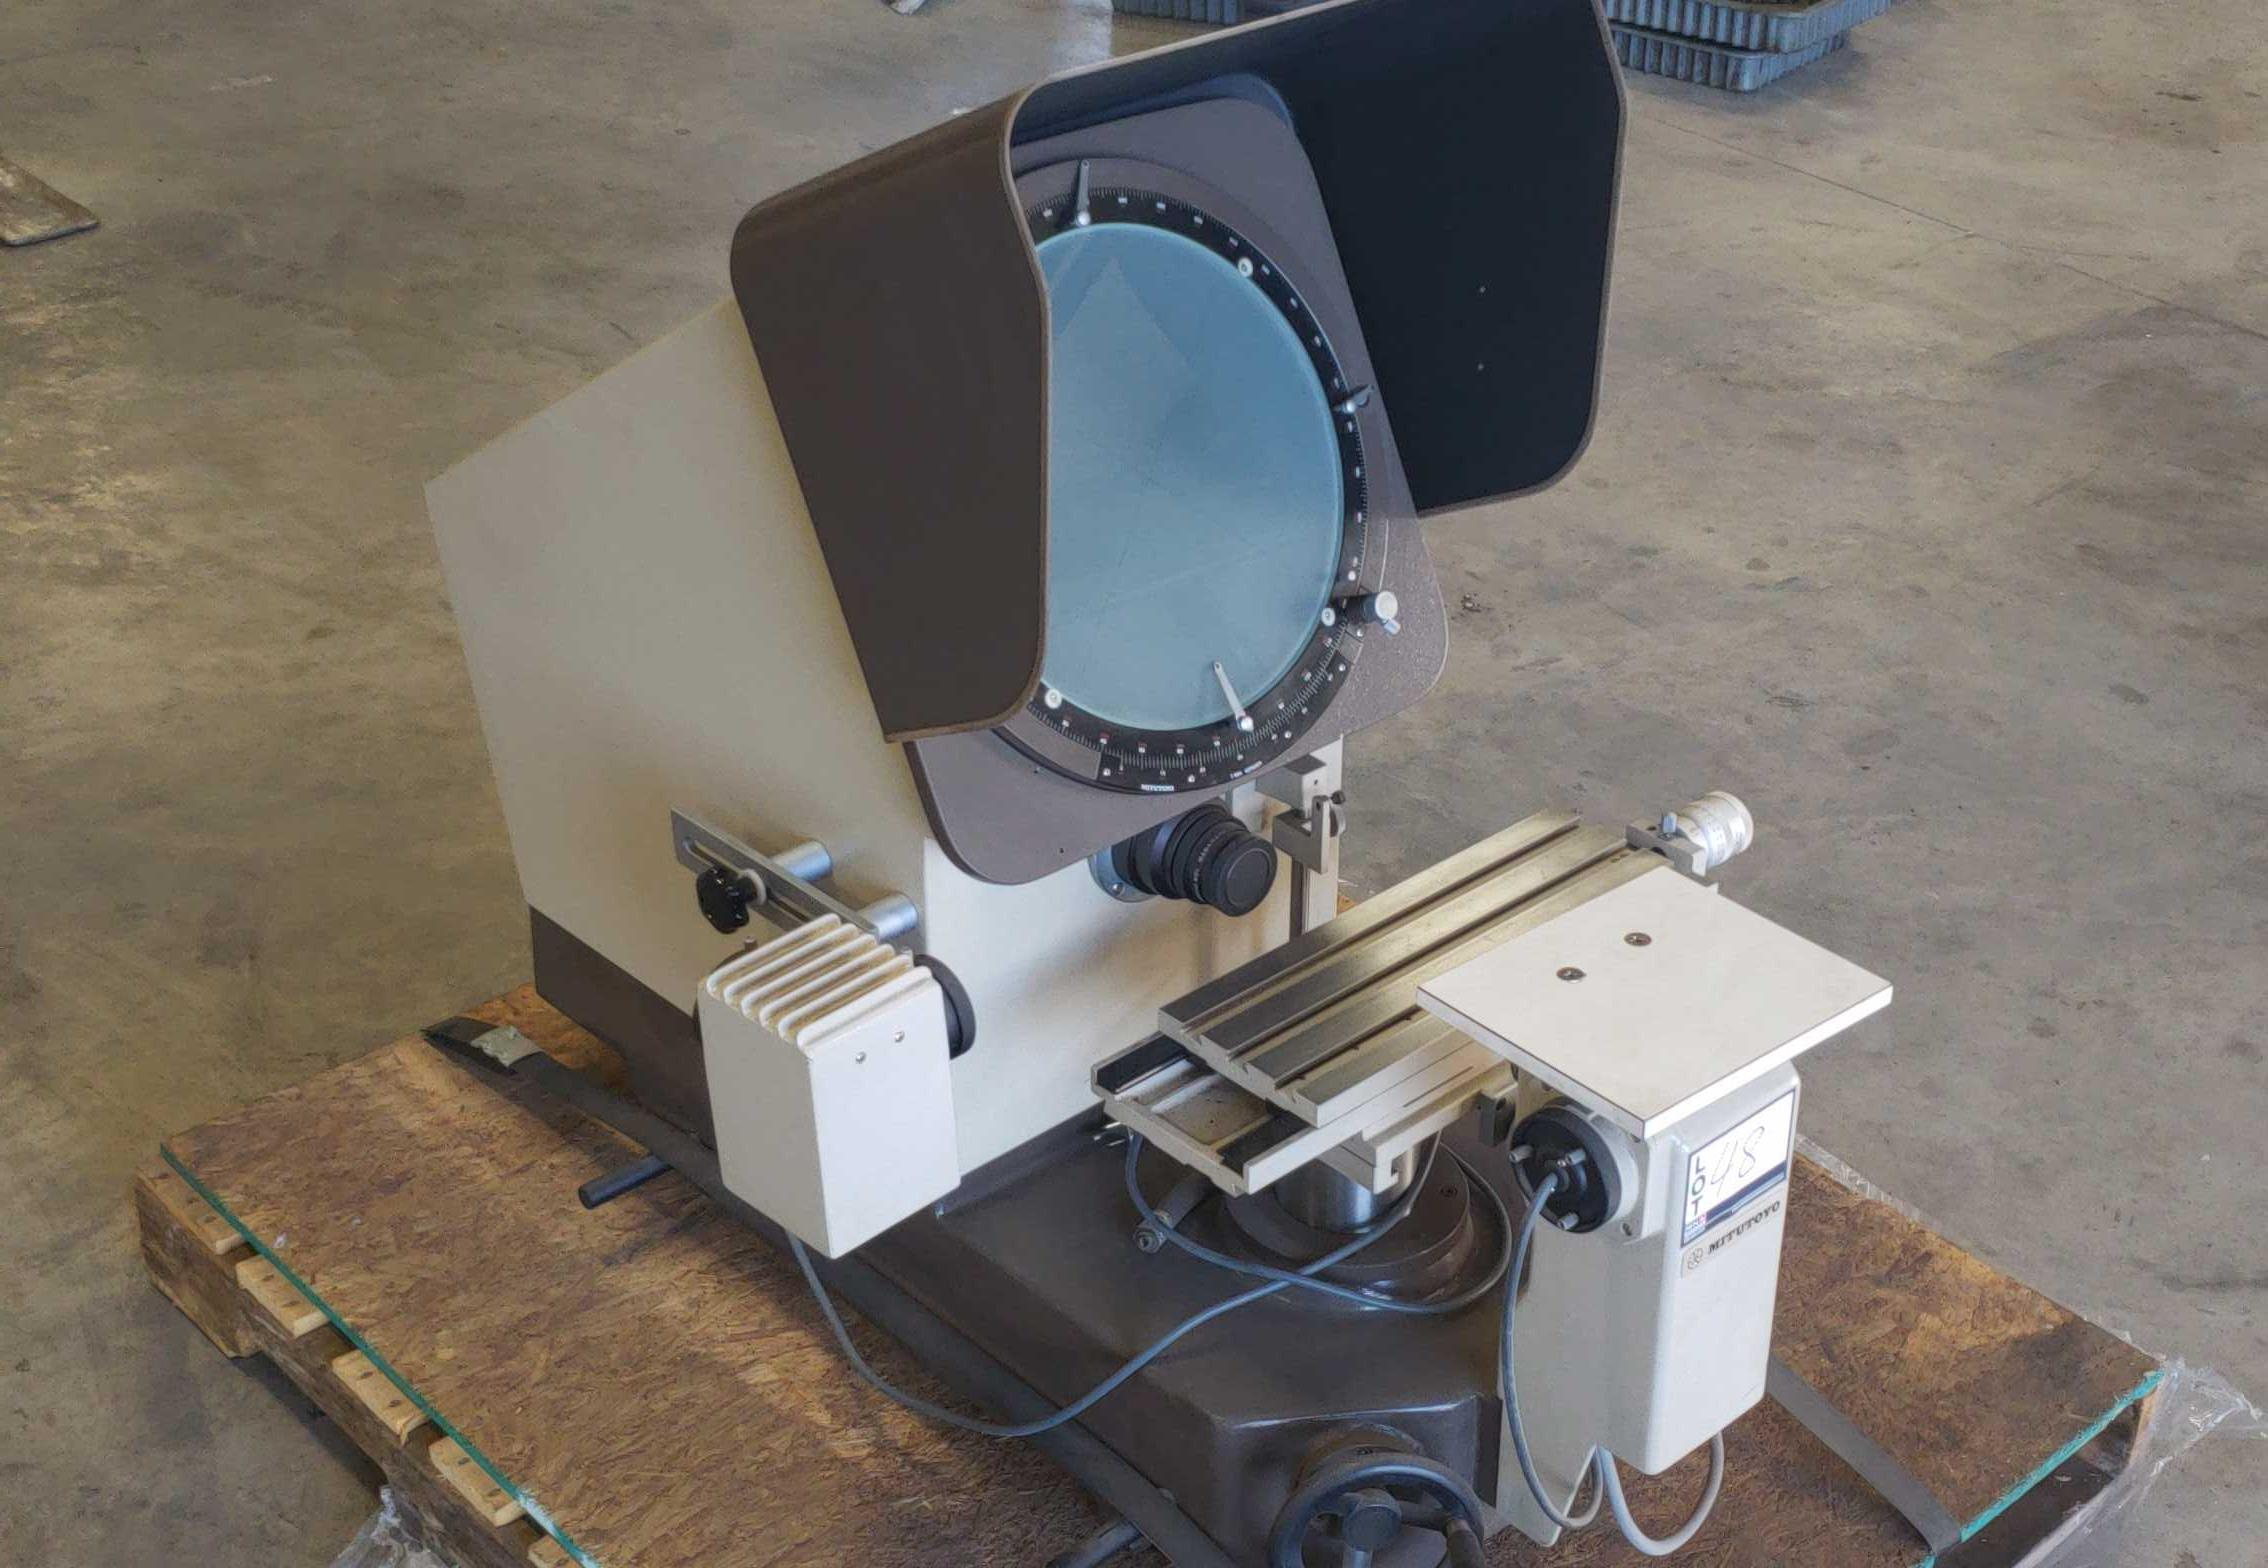 Mitutoyo PH-350 Optical Comparator SN: 40302 - Image 3 of 12